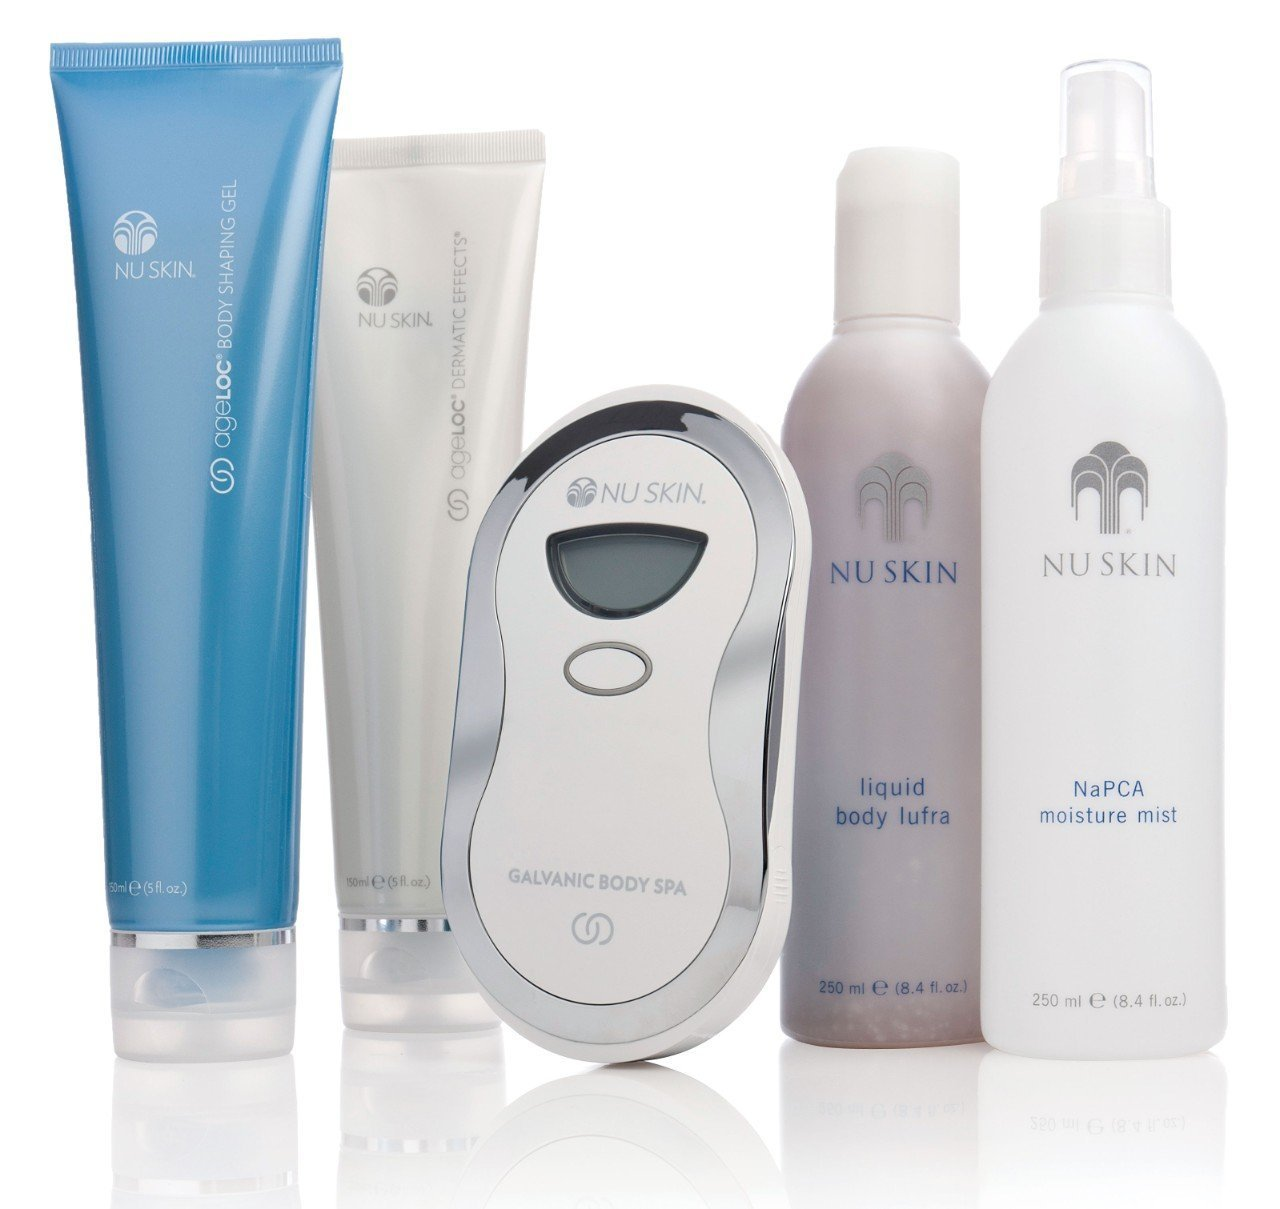 Nu Skin Nuskin Ageloc Galvanic Redesign Body Spa System Kit Brand New